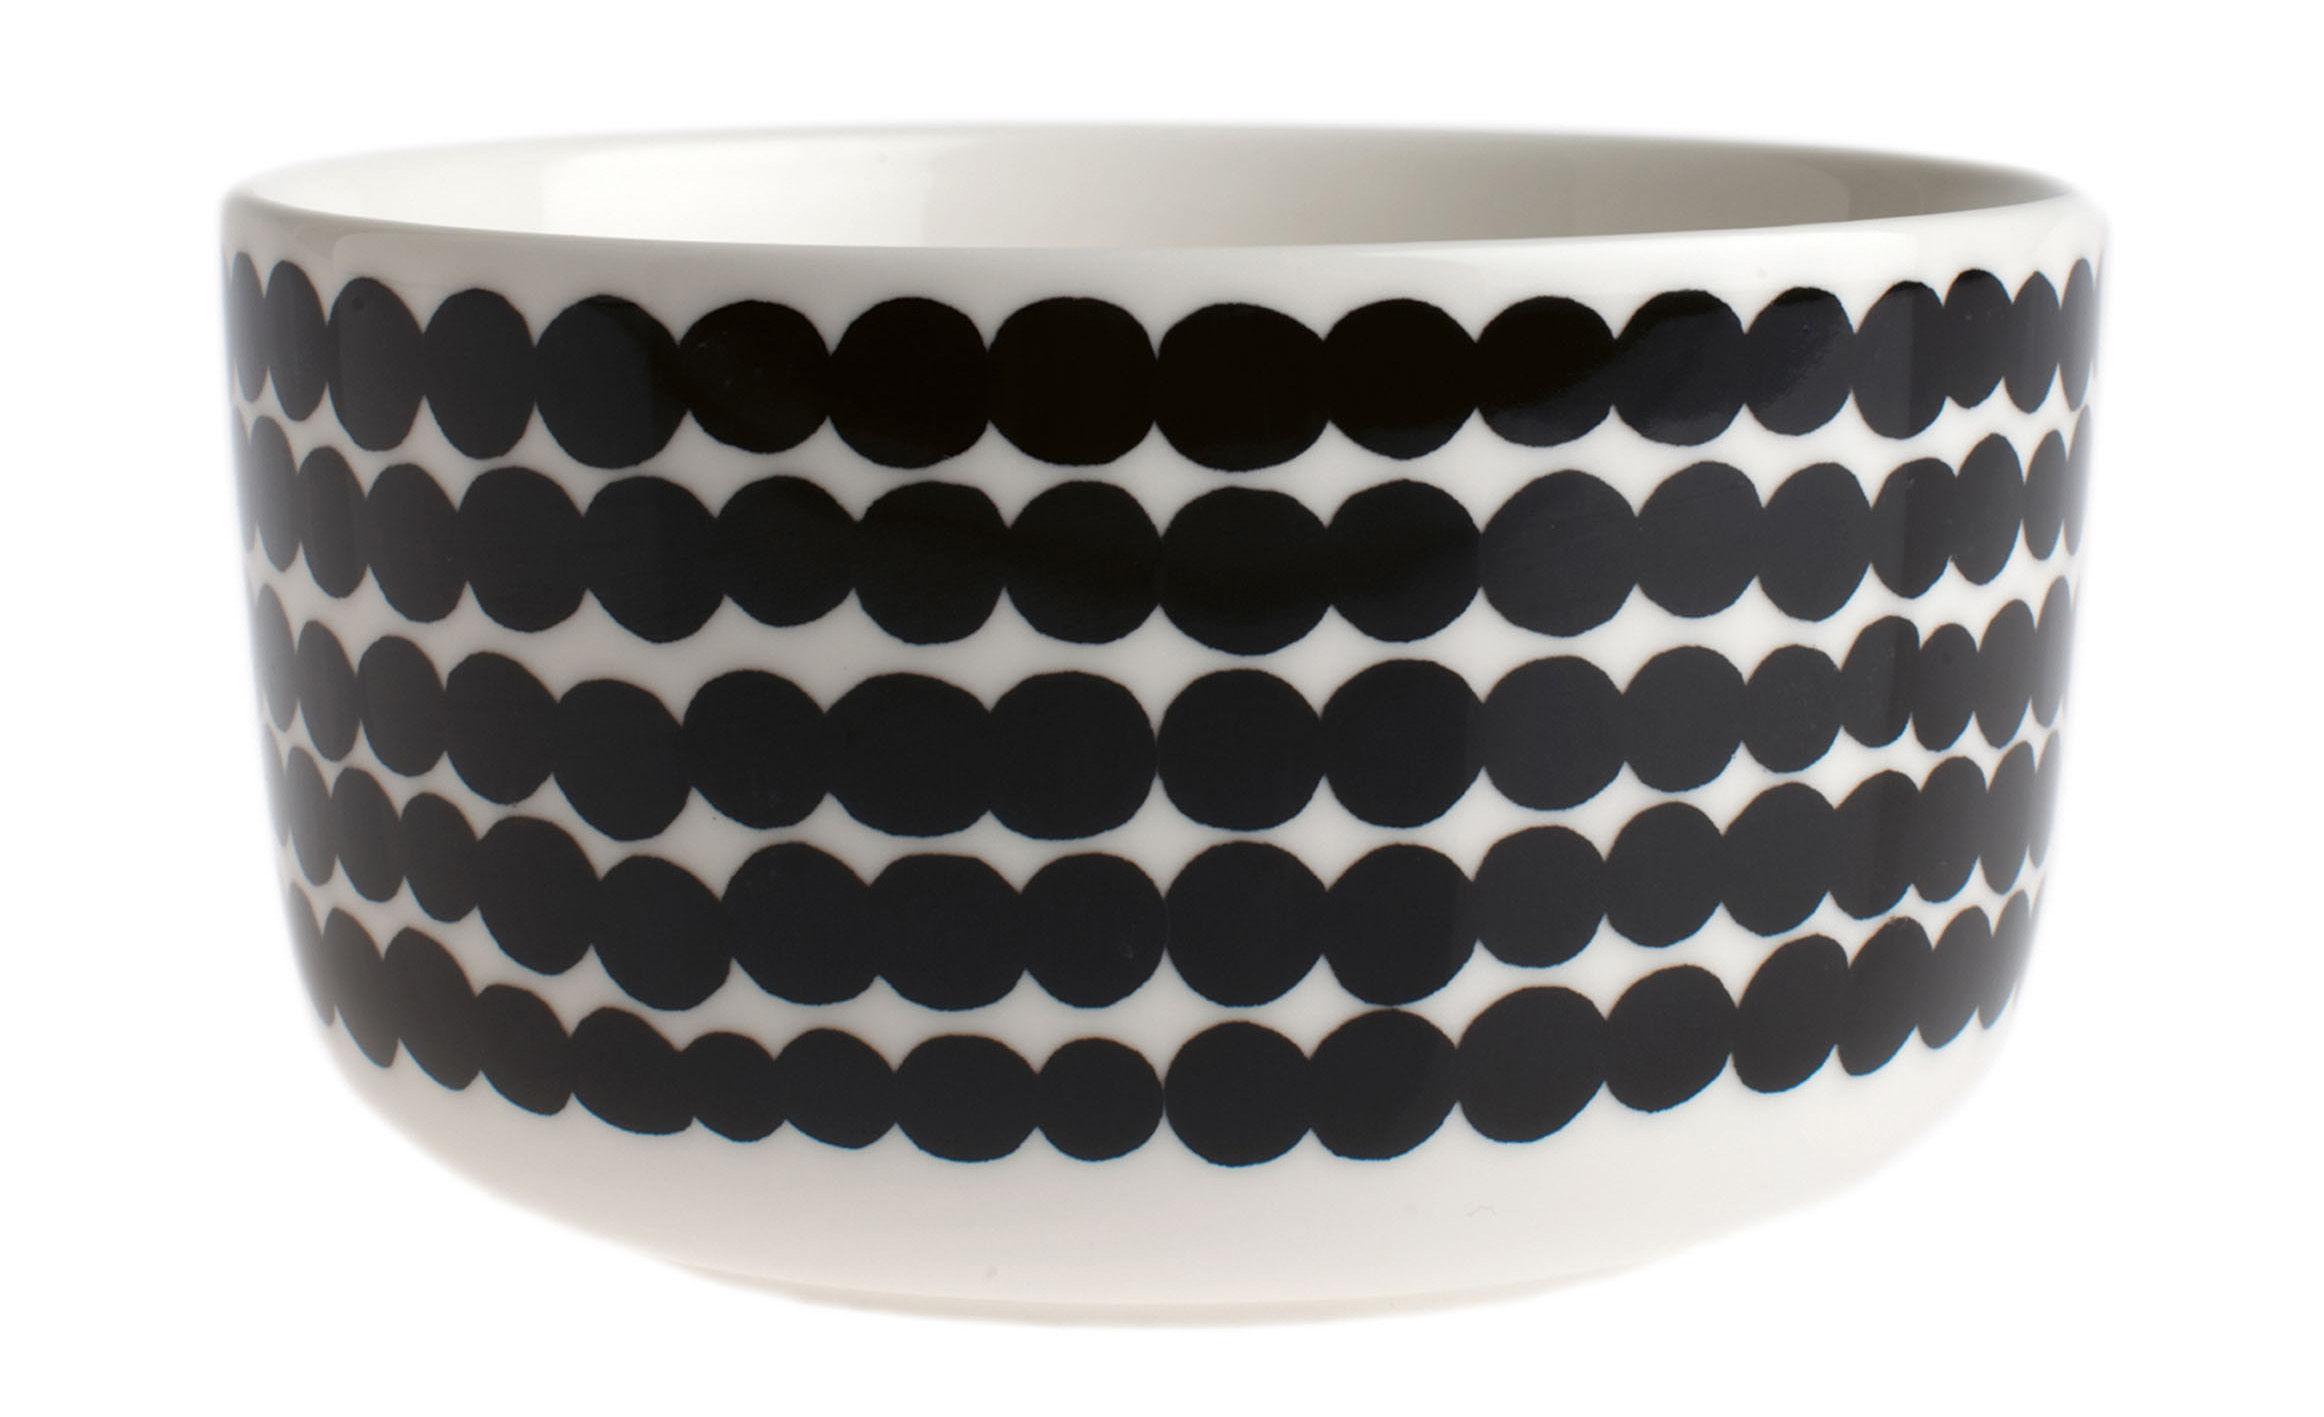 Arts de la table - Saladiers, coupes et bols - Bol Siirtolapuutarha /Ø 12,5 x H 6,5 cm - 50 cl - Marimekko - Siirtolapuutarha / Noir & blanc - Porcelaine émaillée